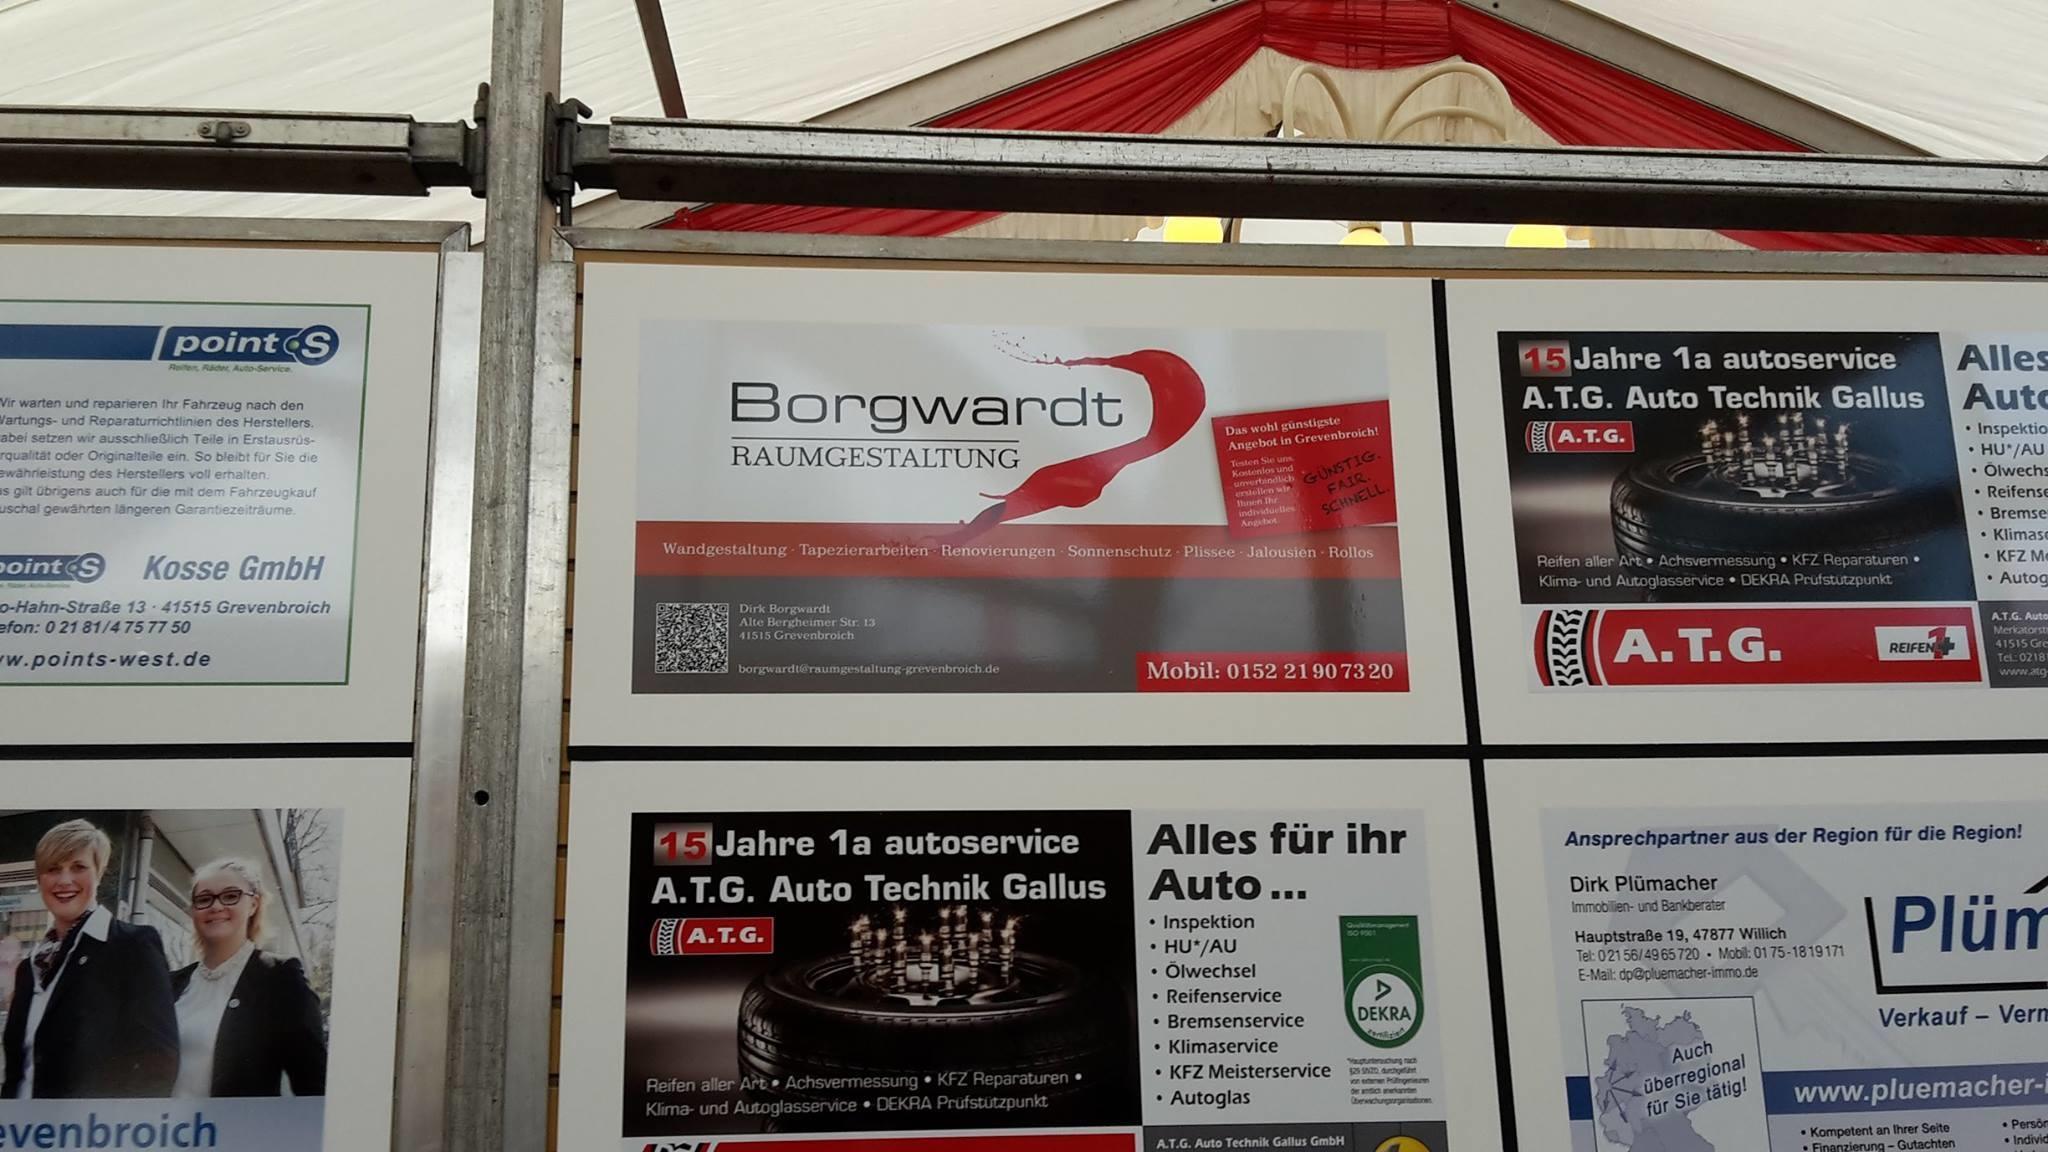 Raumgestaltung Borgwardt